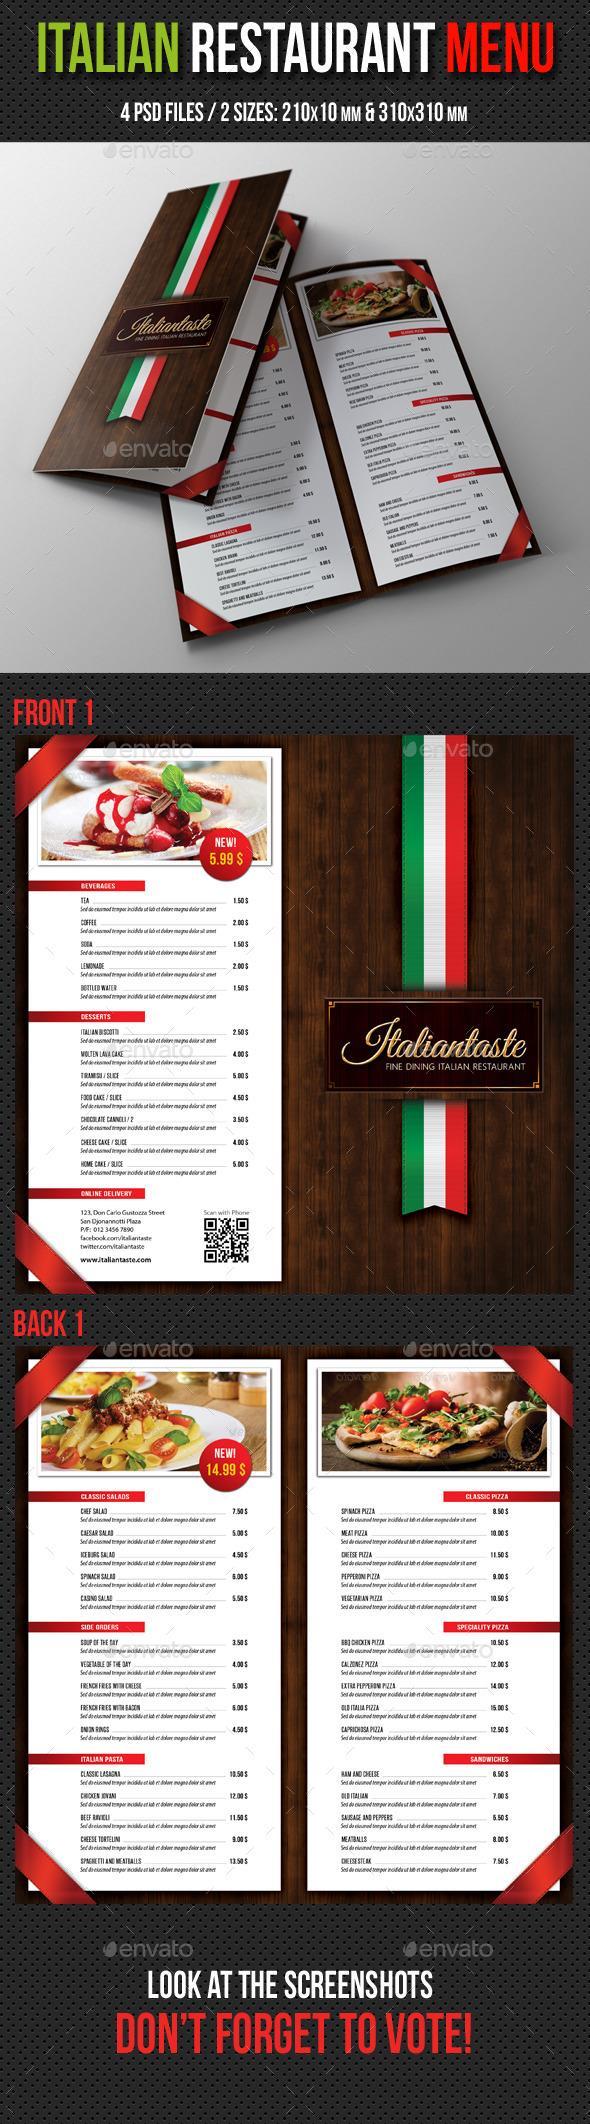 Italian Restaurant Menu Brochure | Restaurante, Menus restaurantes y ...